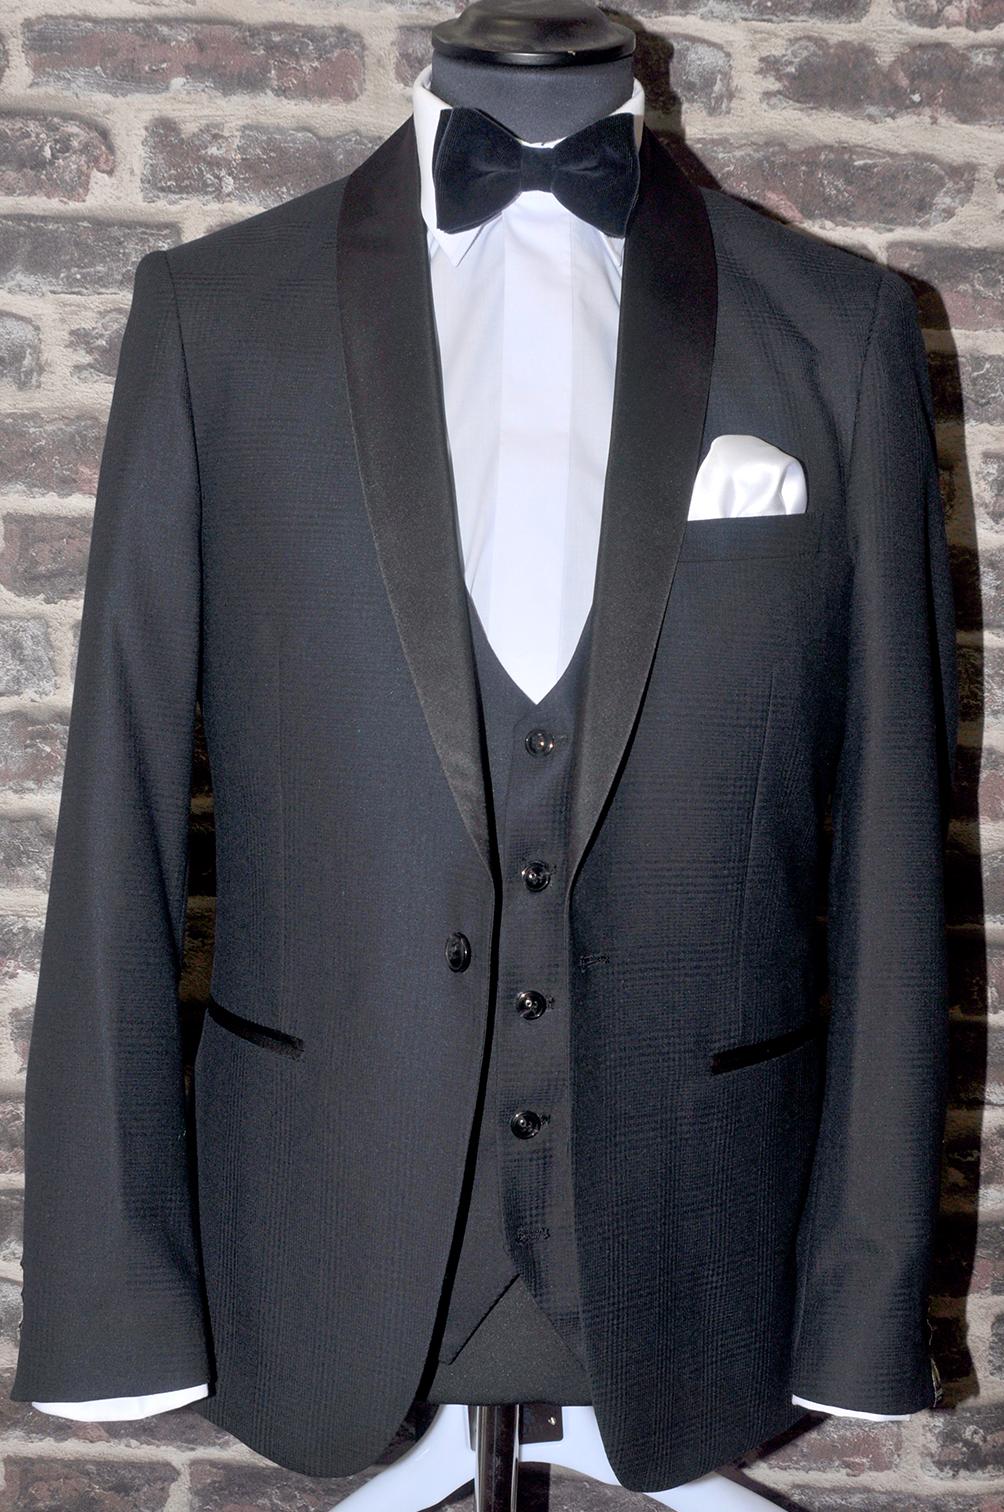 Shawl Lapel Black Check Tuxedo